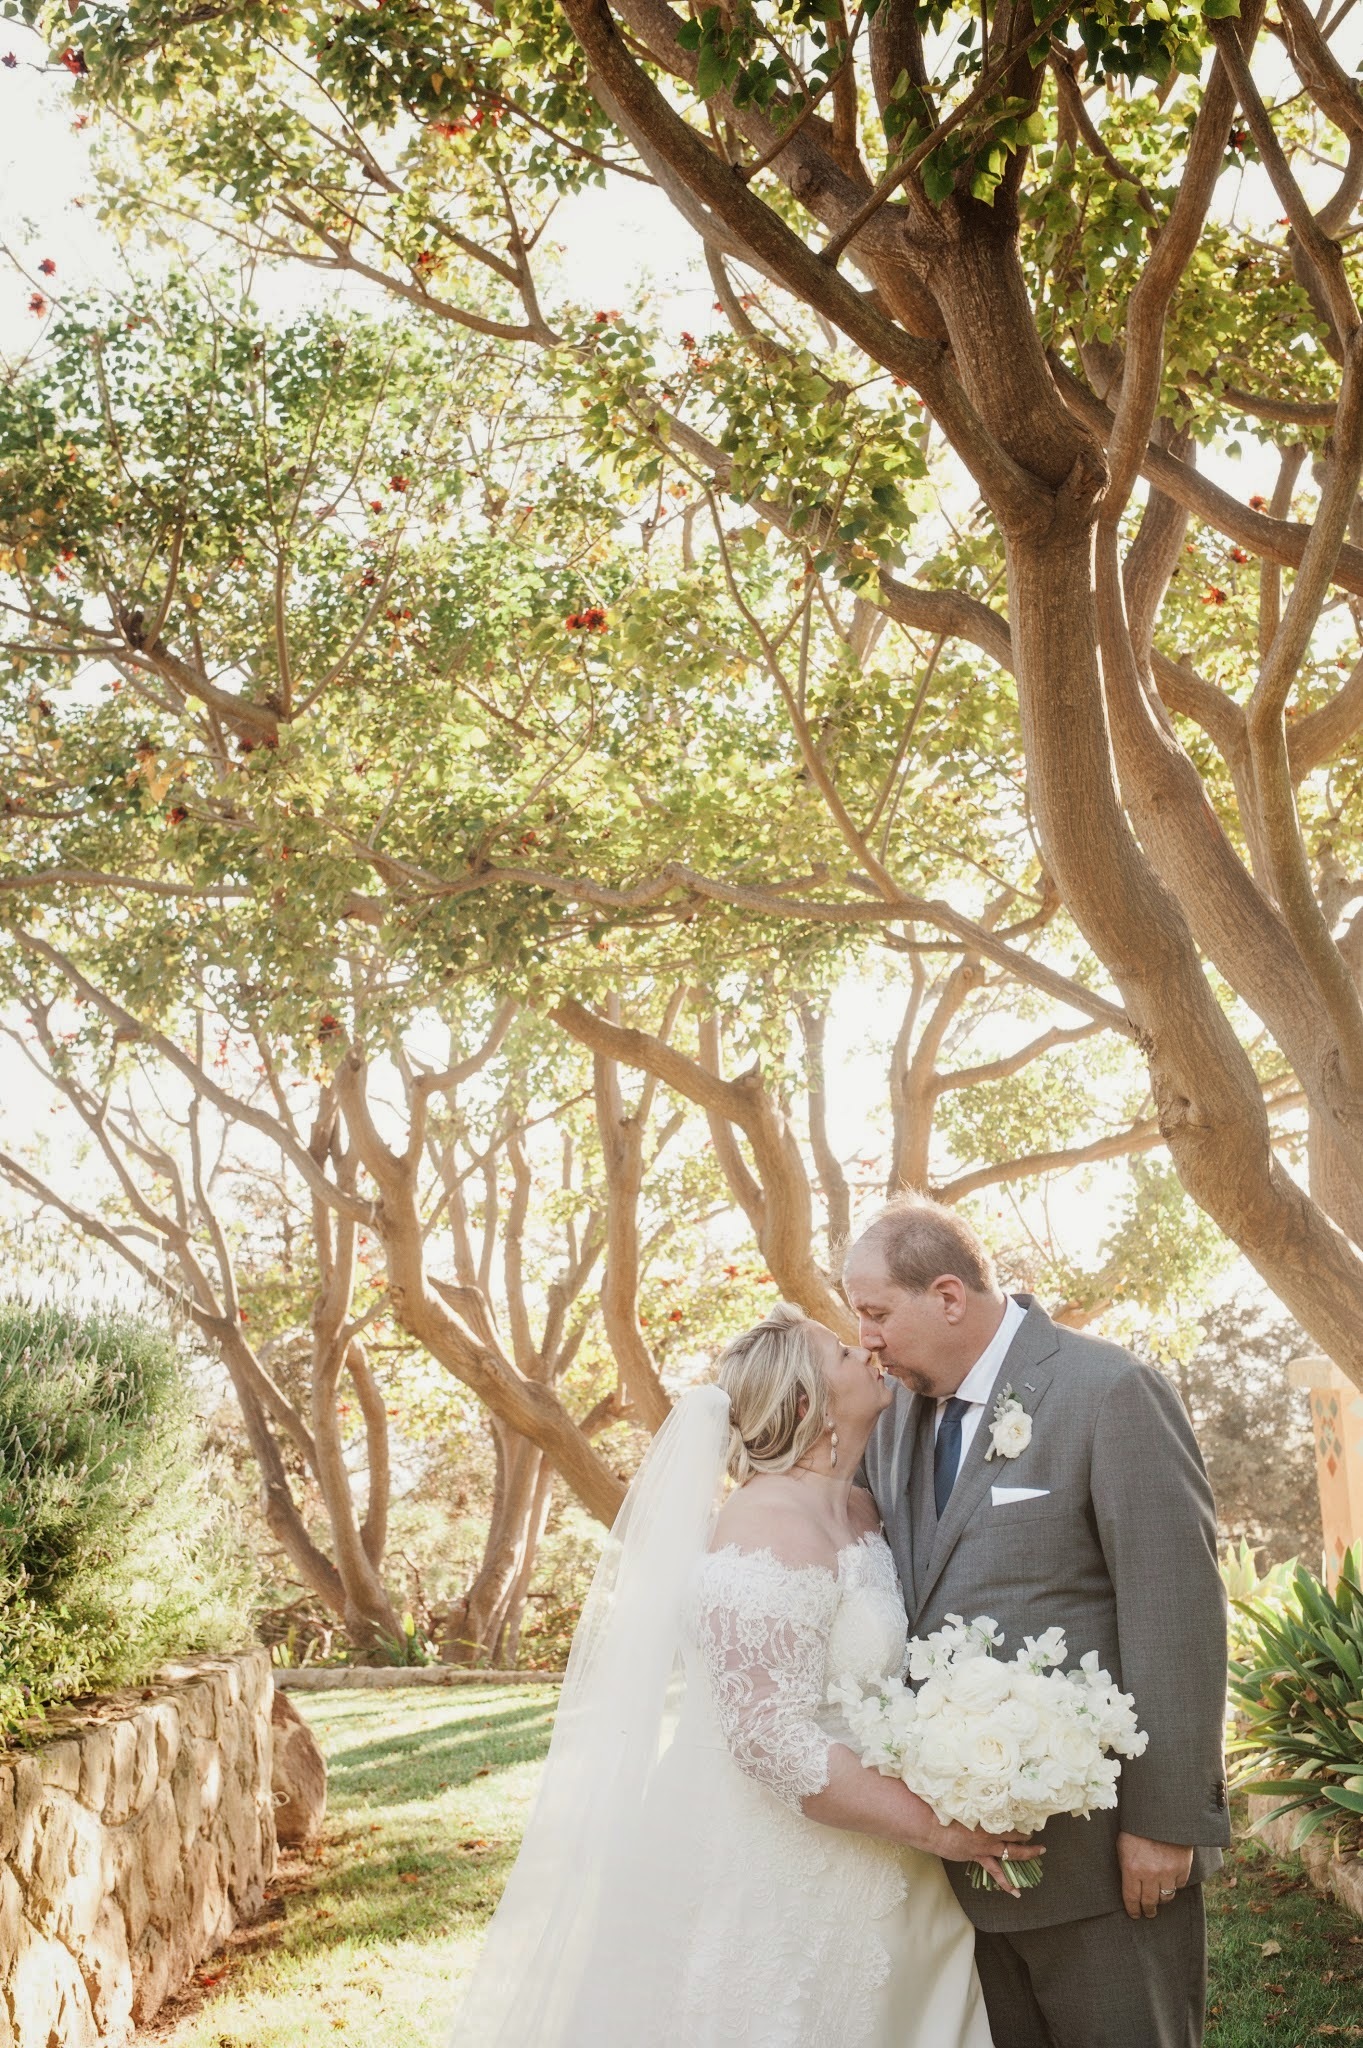 www.santabarbarawedding.com | Andrejka Photography | Villa Verano | Wedding Venue | Private Estate | Bride and Groom